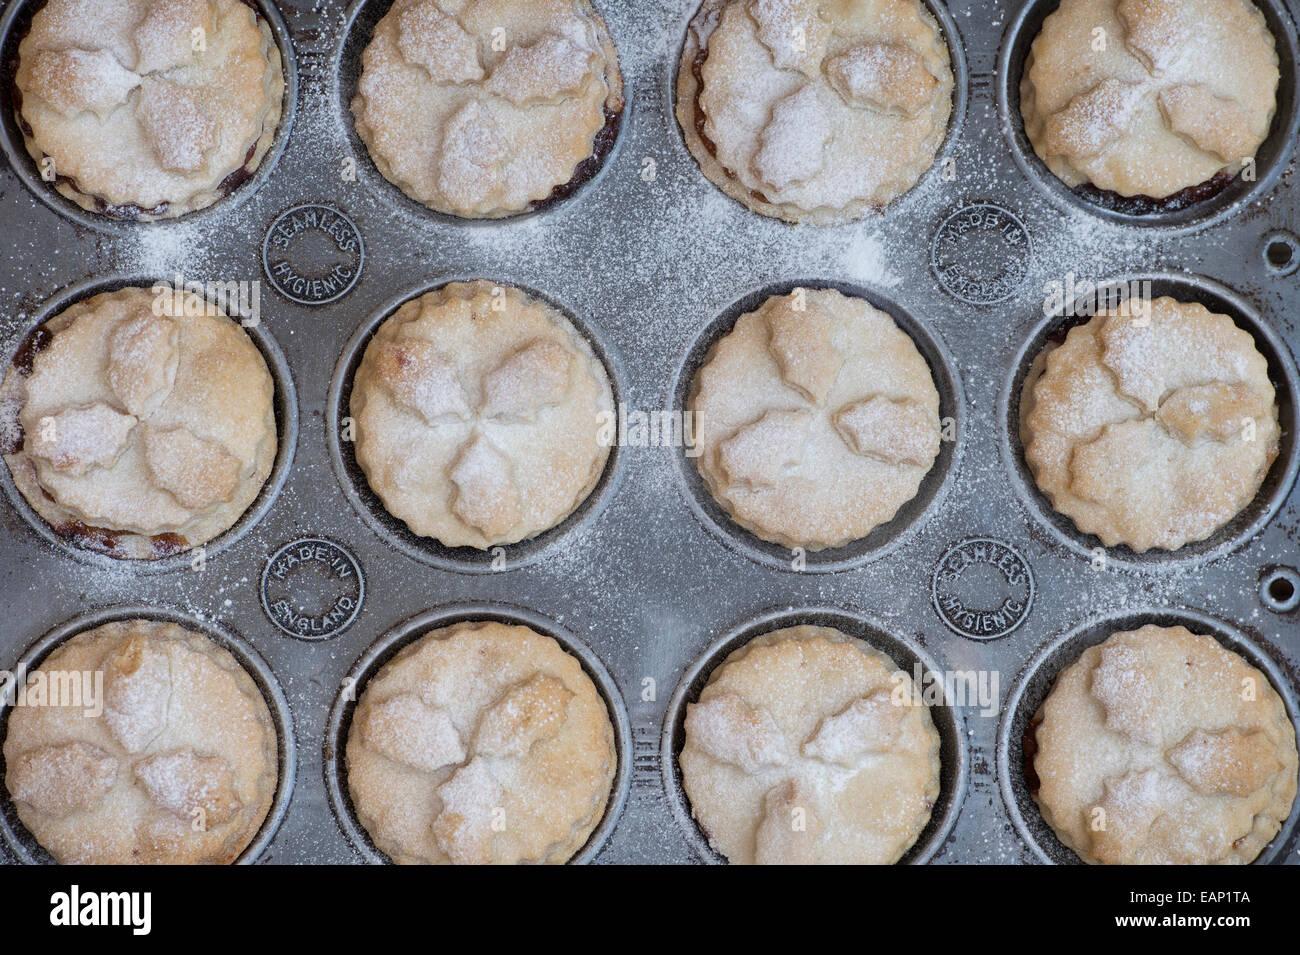 Hornear tartas caseras picadillo de Navidad Imagen De Stock